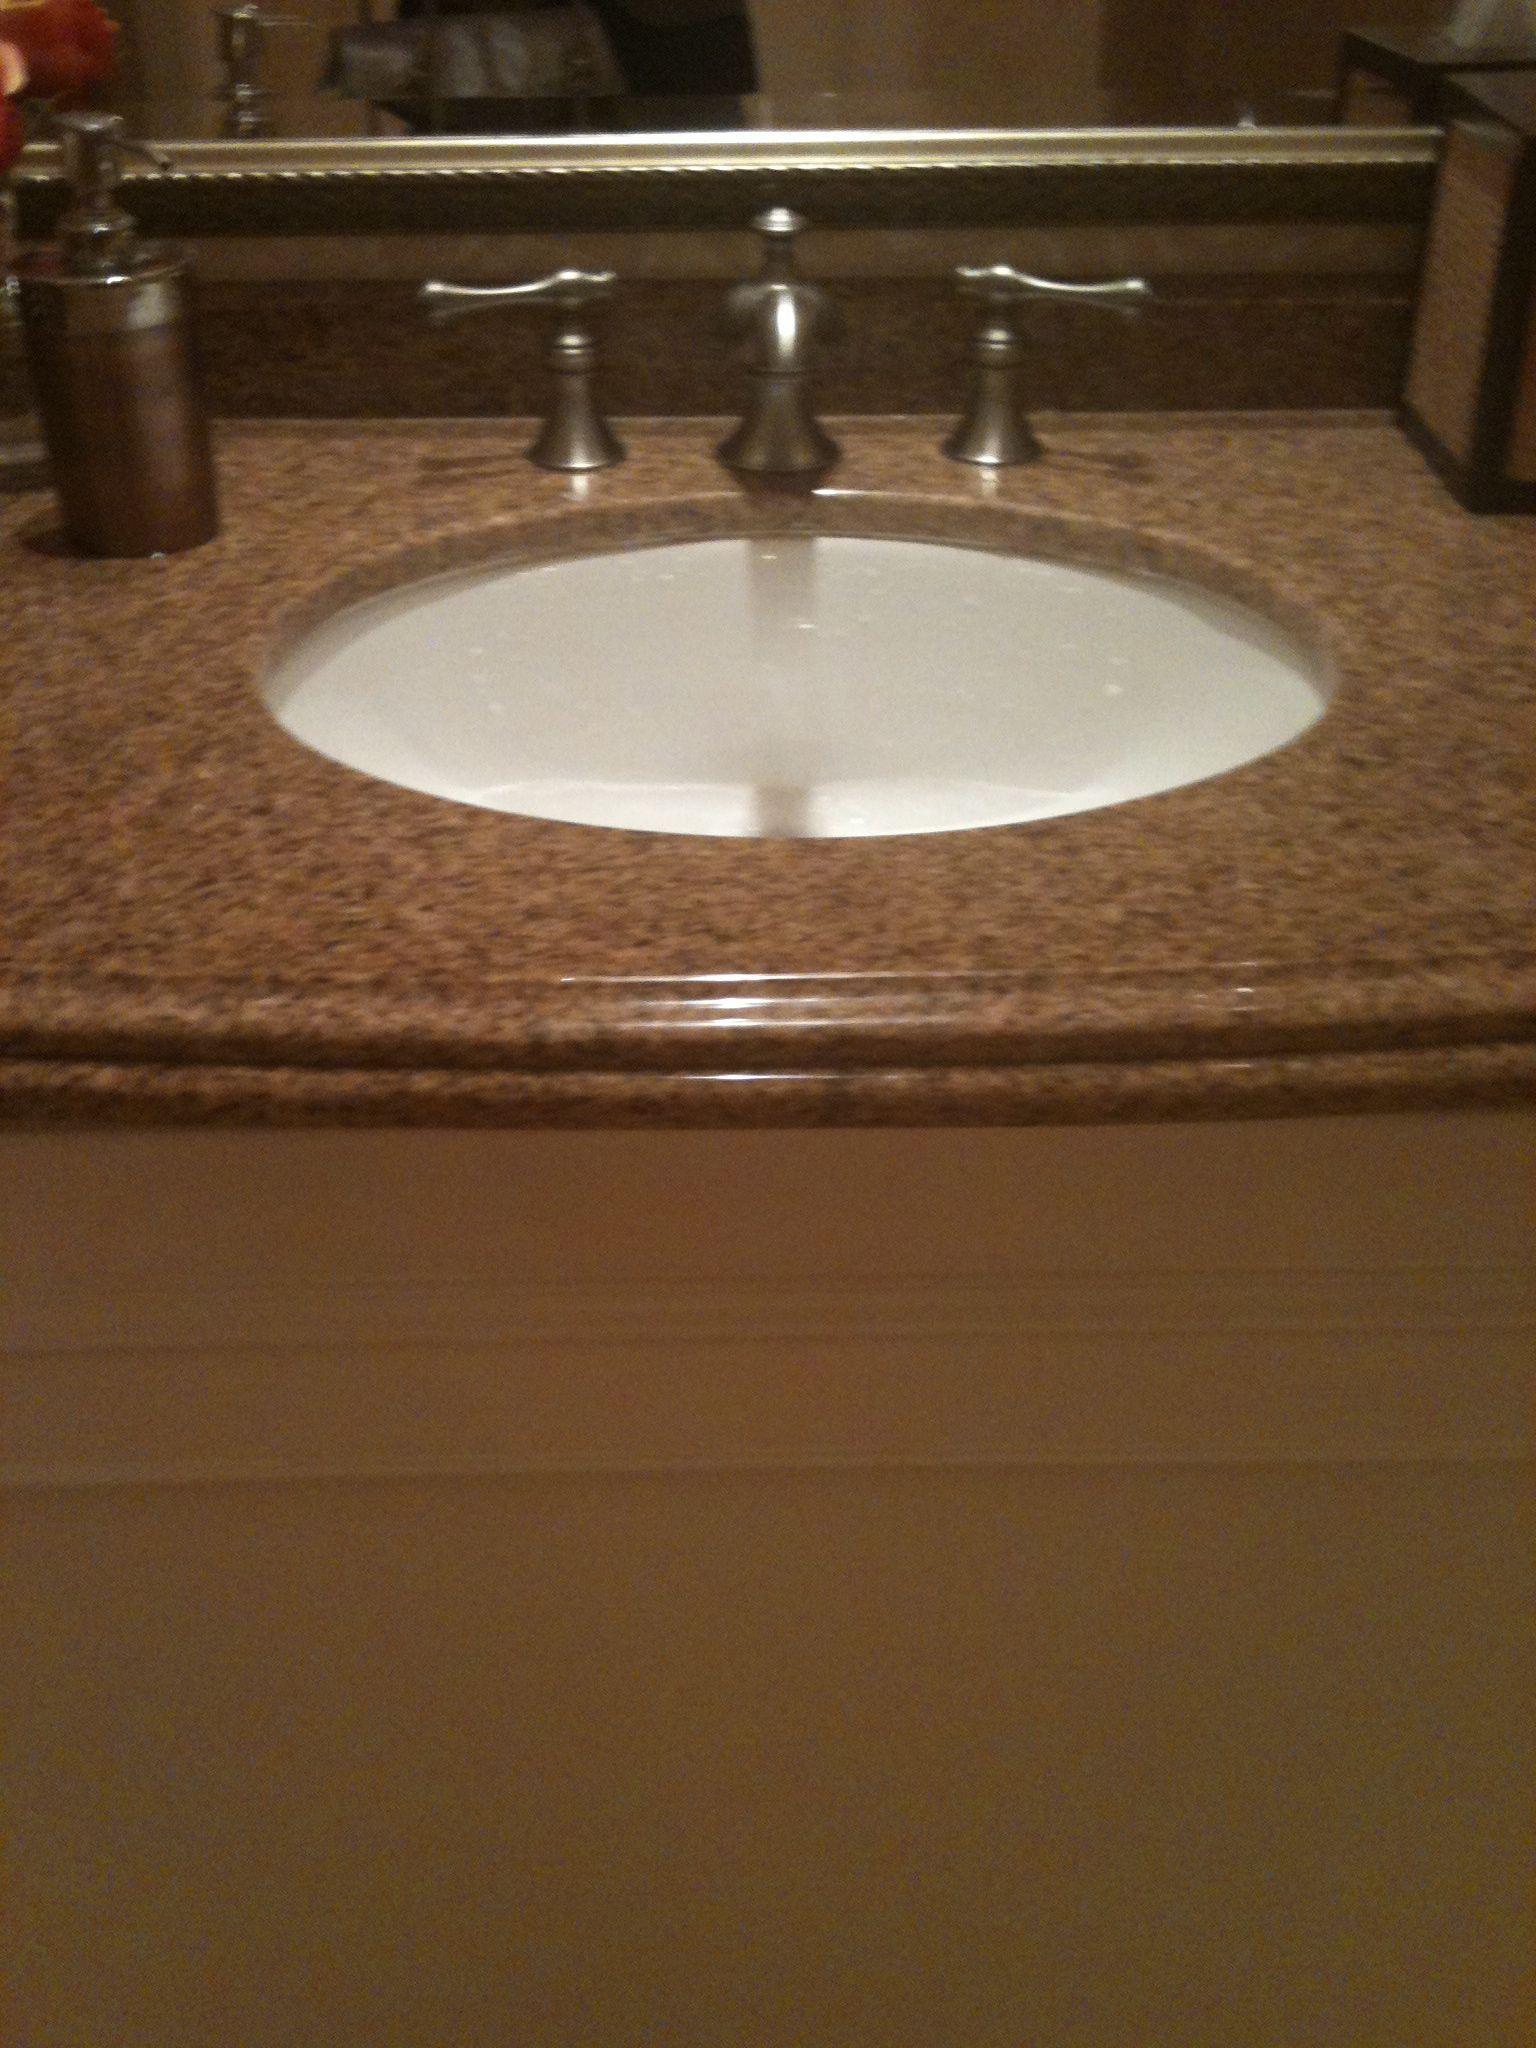 White Undermount Sink : white undermount sink bathroom inspiration Pinterest